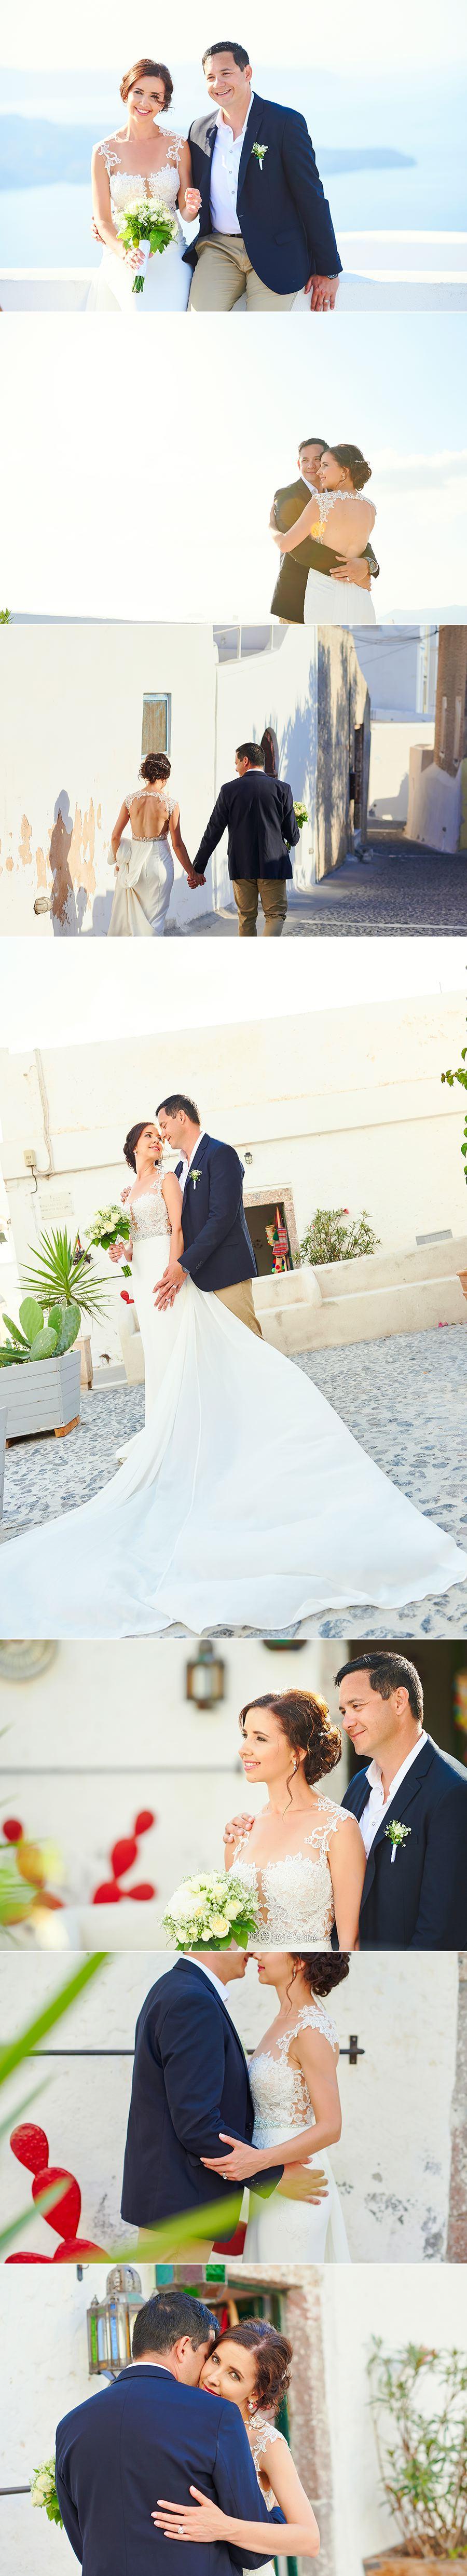 paul-simone-wedding-photos-09